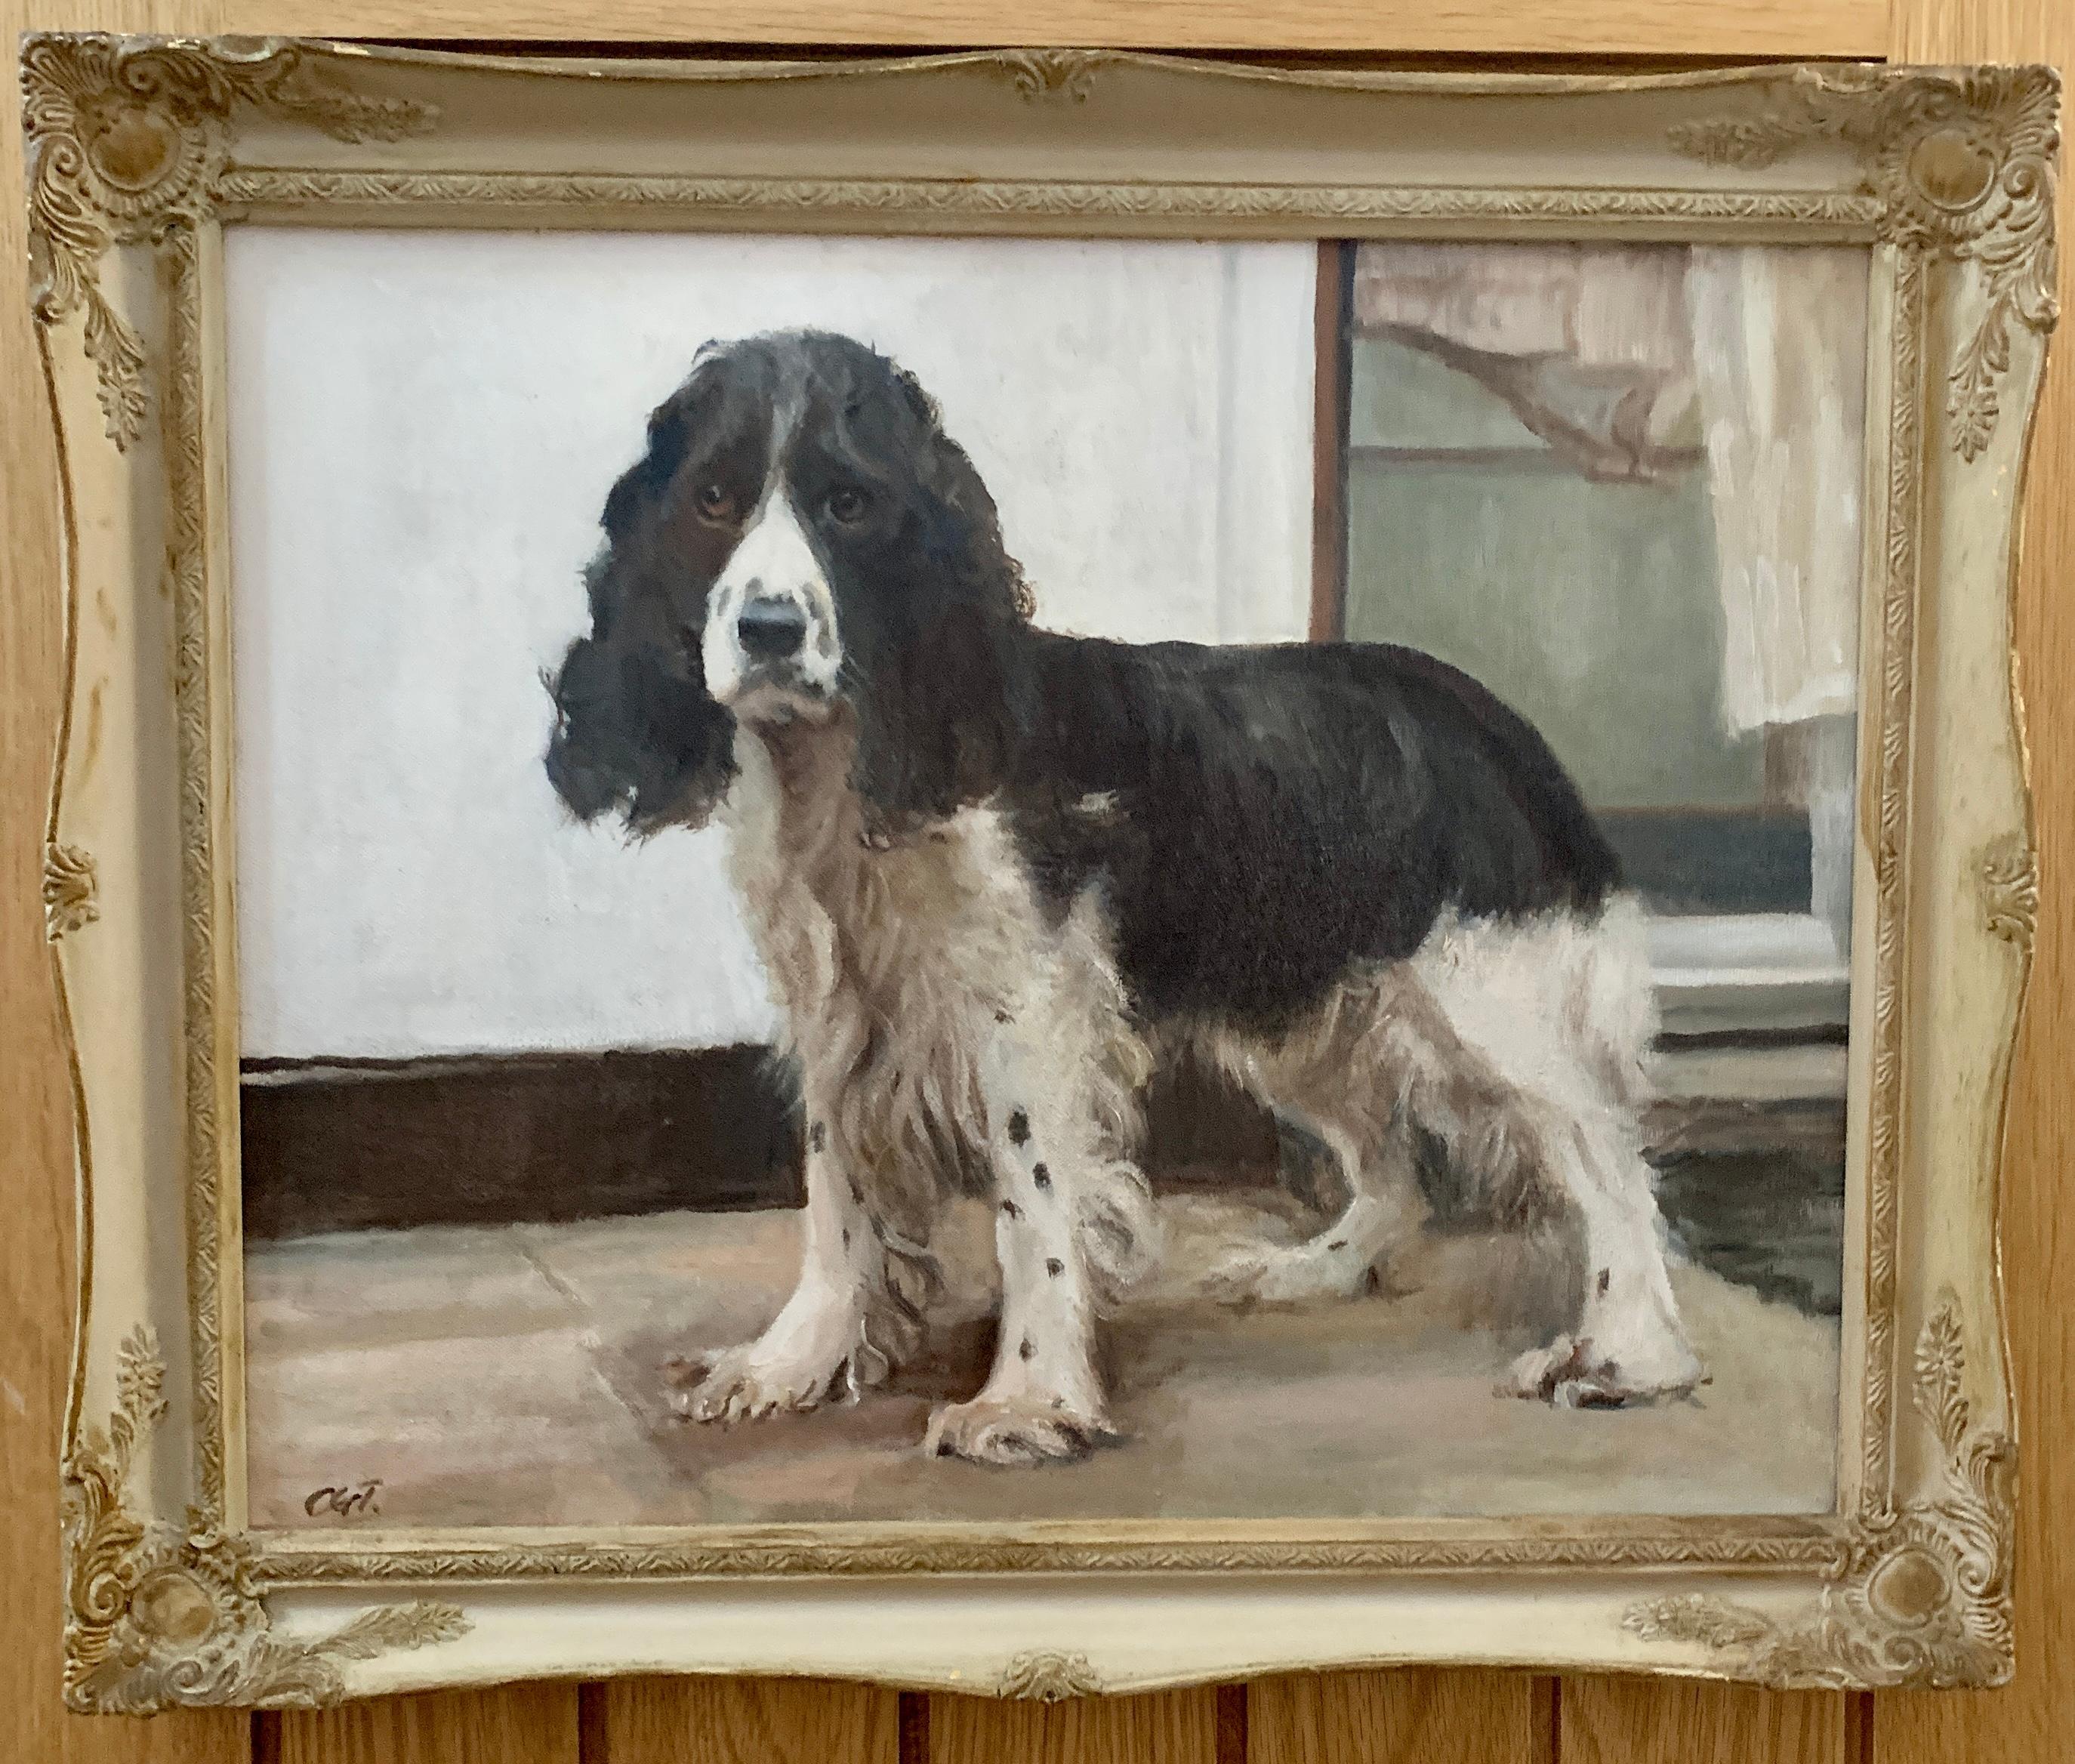 20th century English portrait of a standing Springer Spaniel dog.